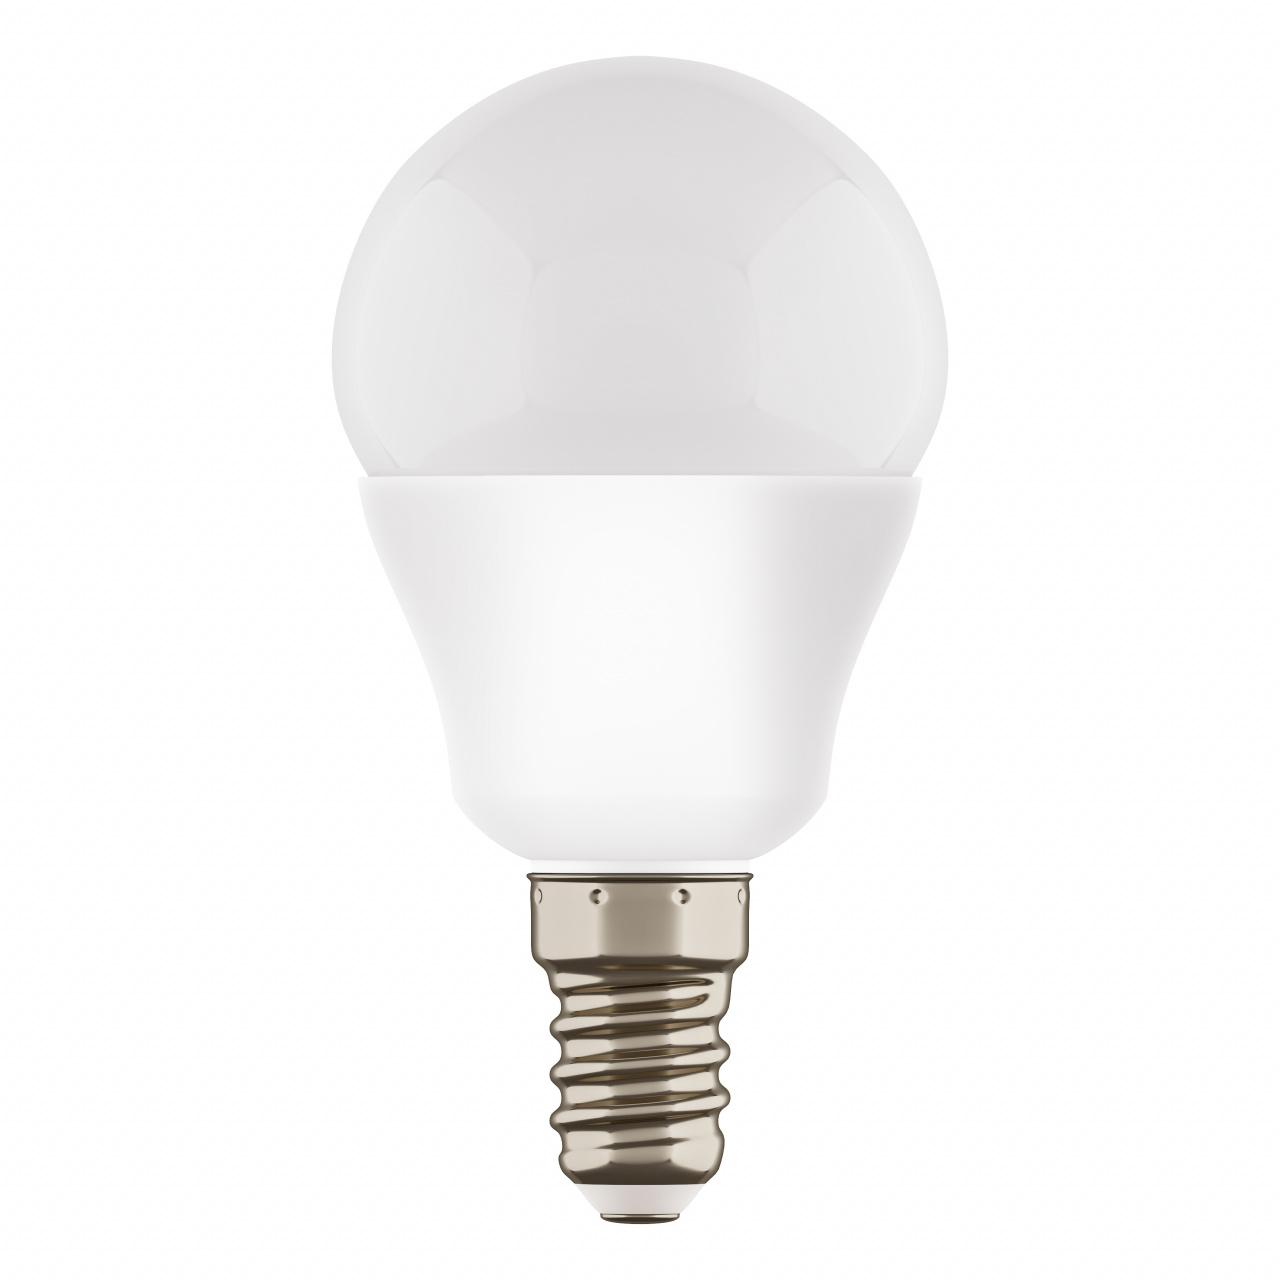 Лампа LED 220V G45 E14 7W=65W 350LM 180G FR 3000K 20000H Lightstar 940802